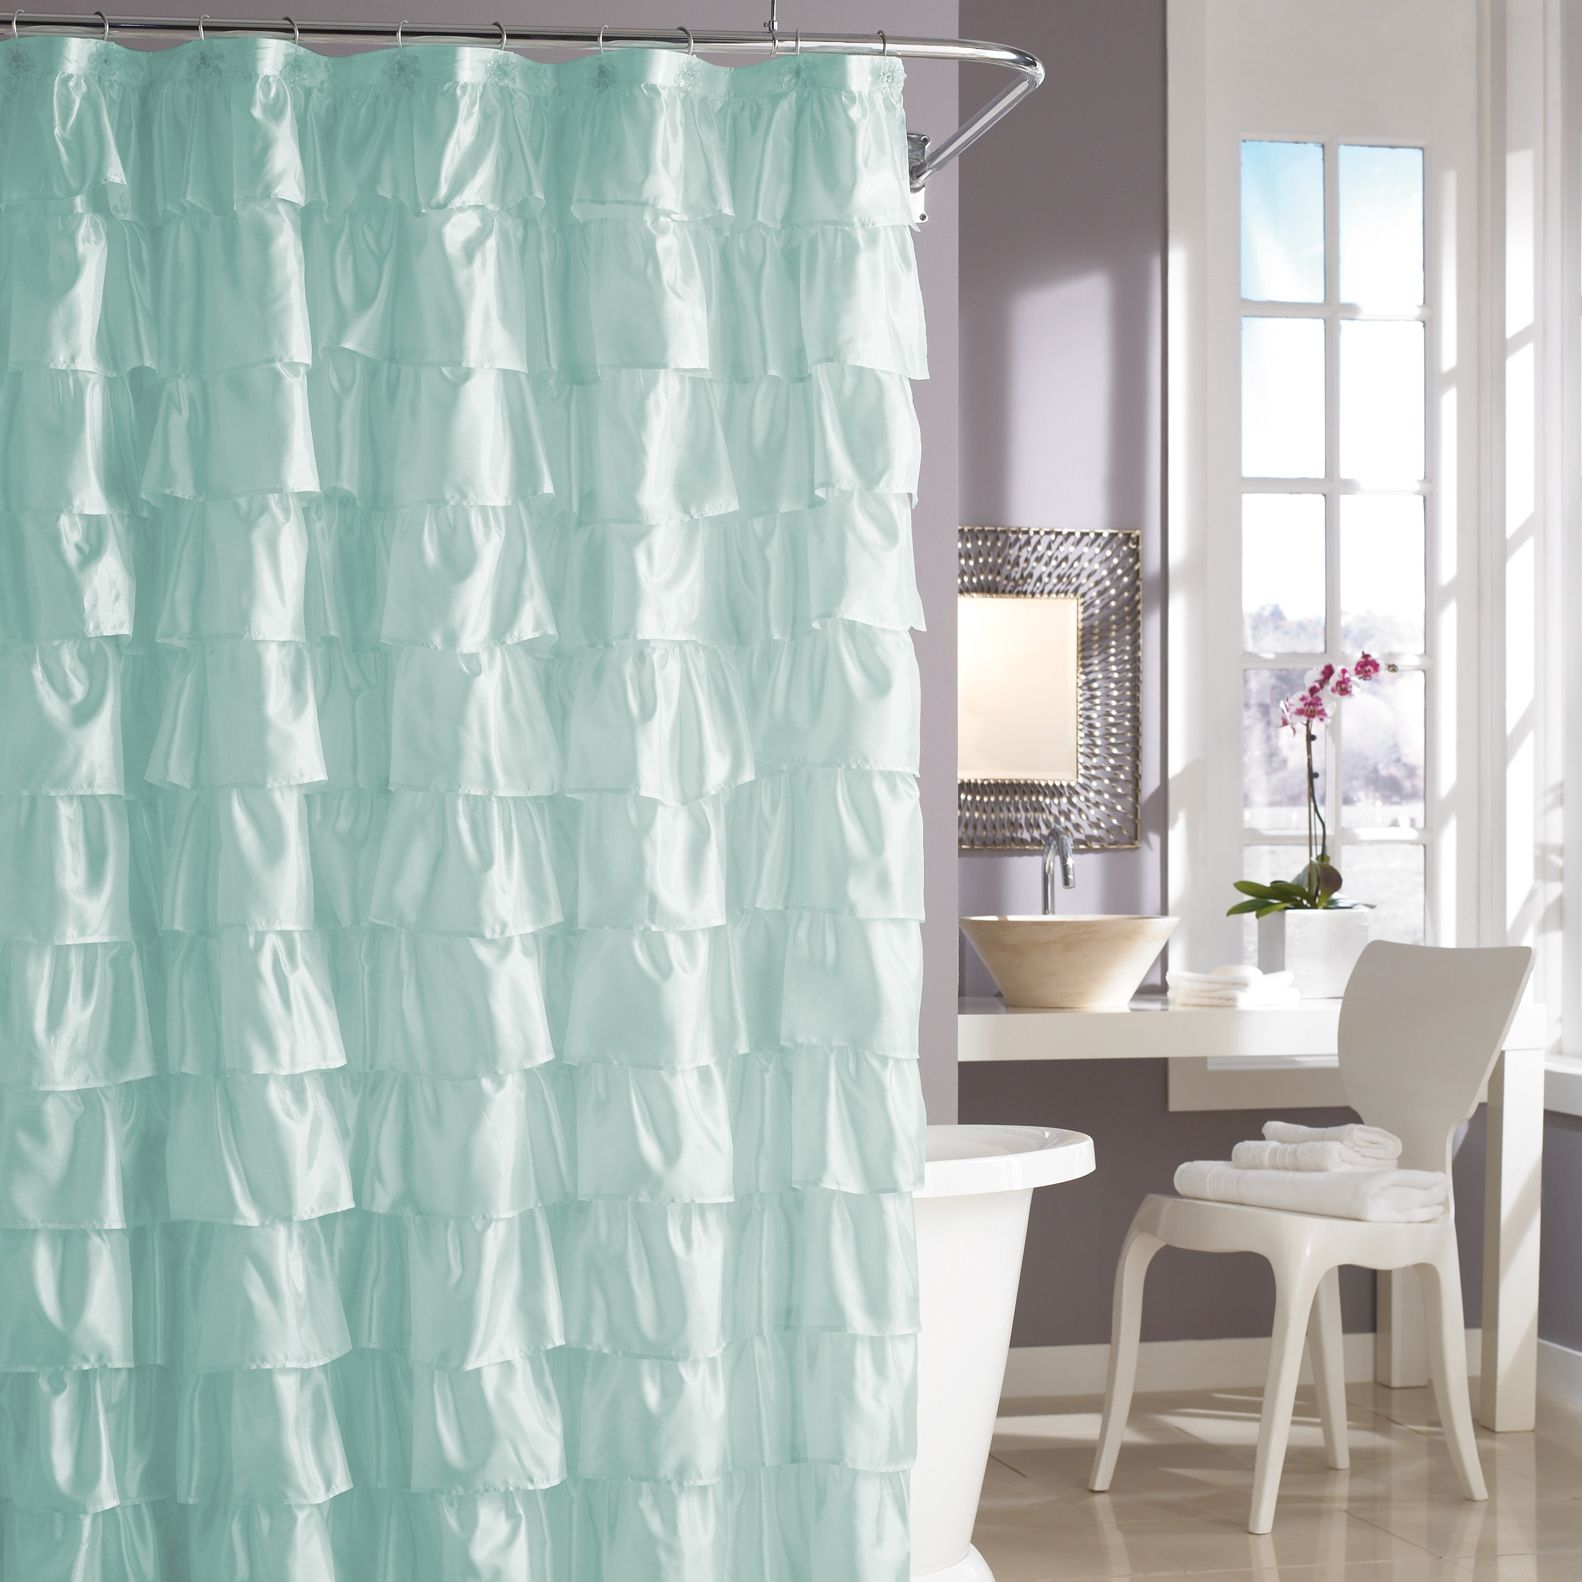 Steve Madden Ruffles Shower Curtain in Pale Aqua // looks kind of ...